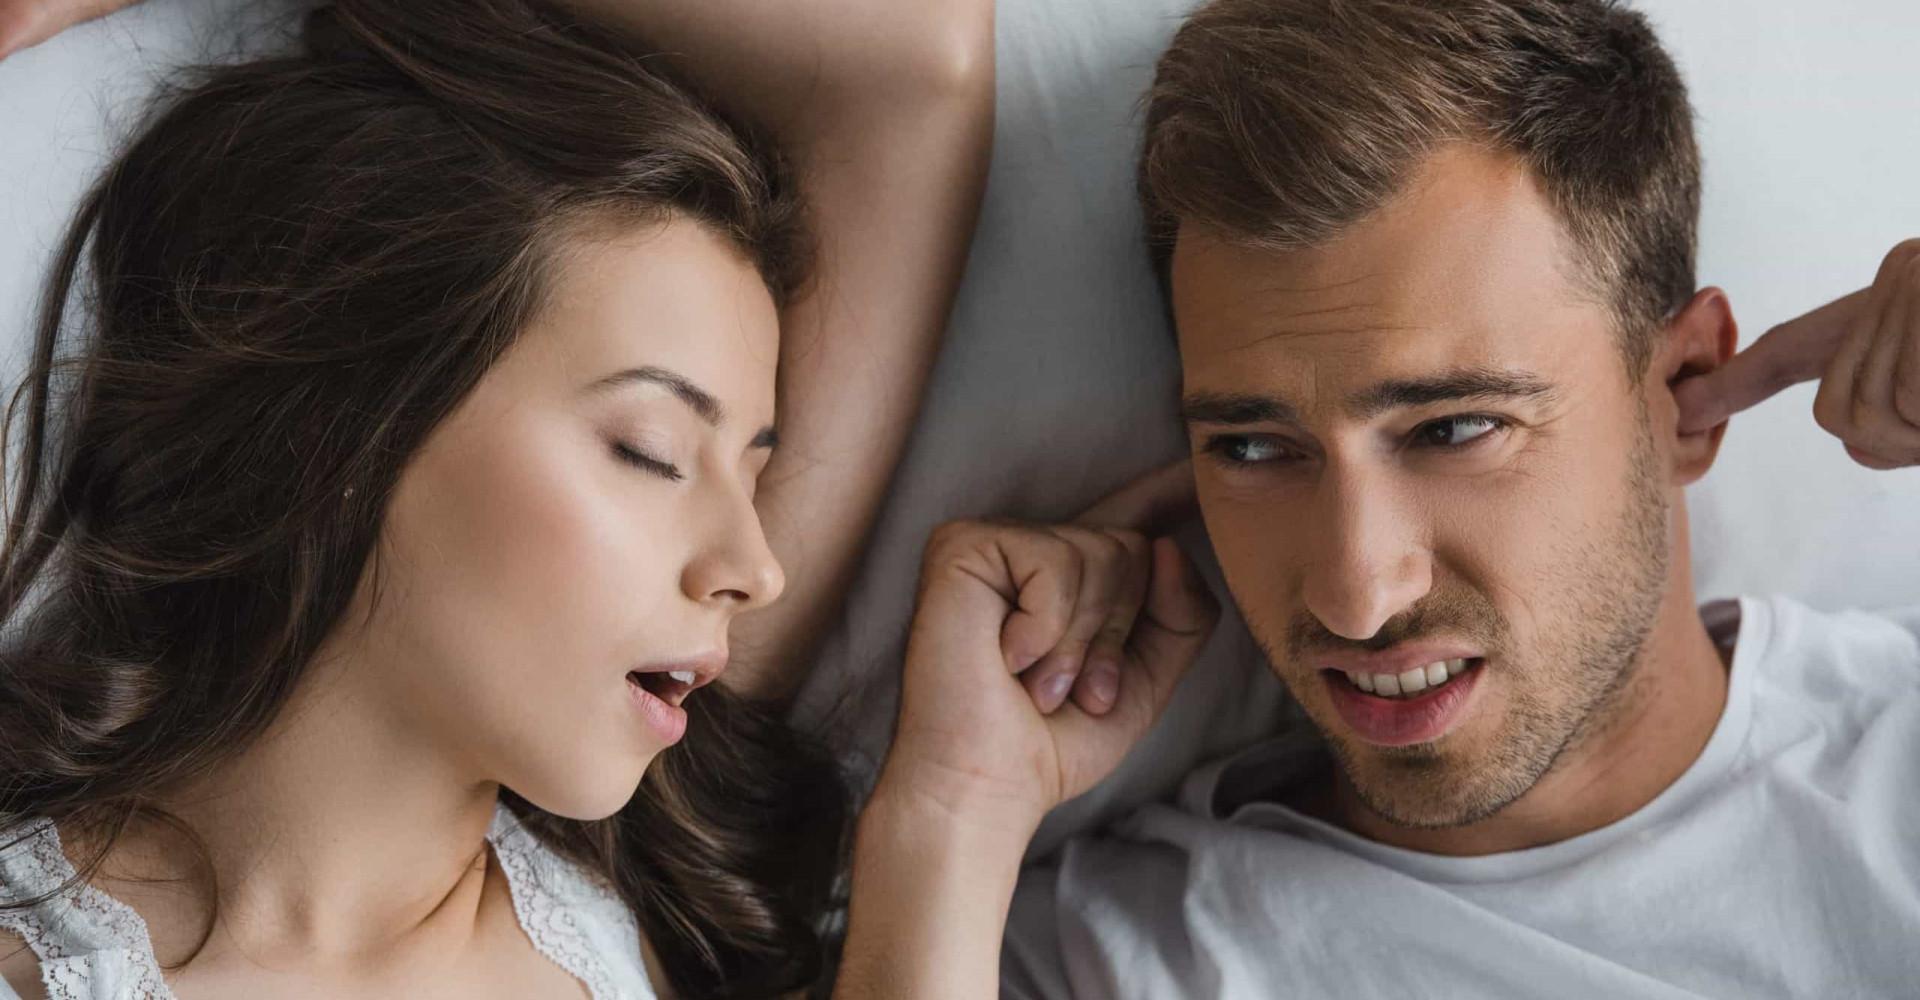 Mannen en vrouwen snurken even luid